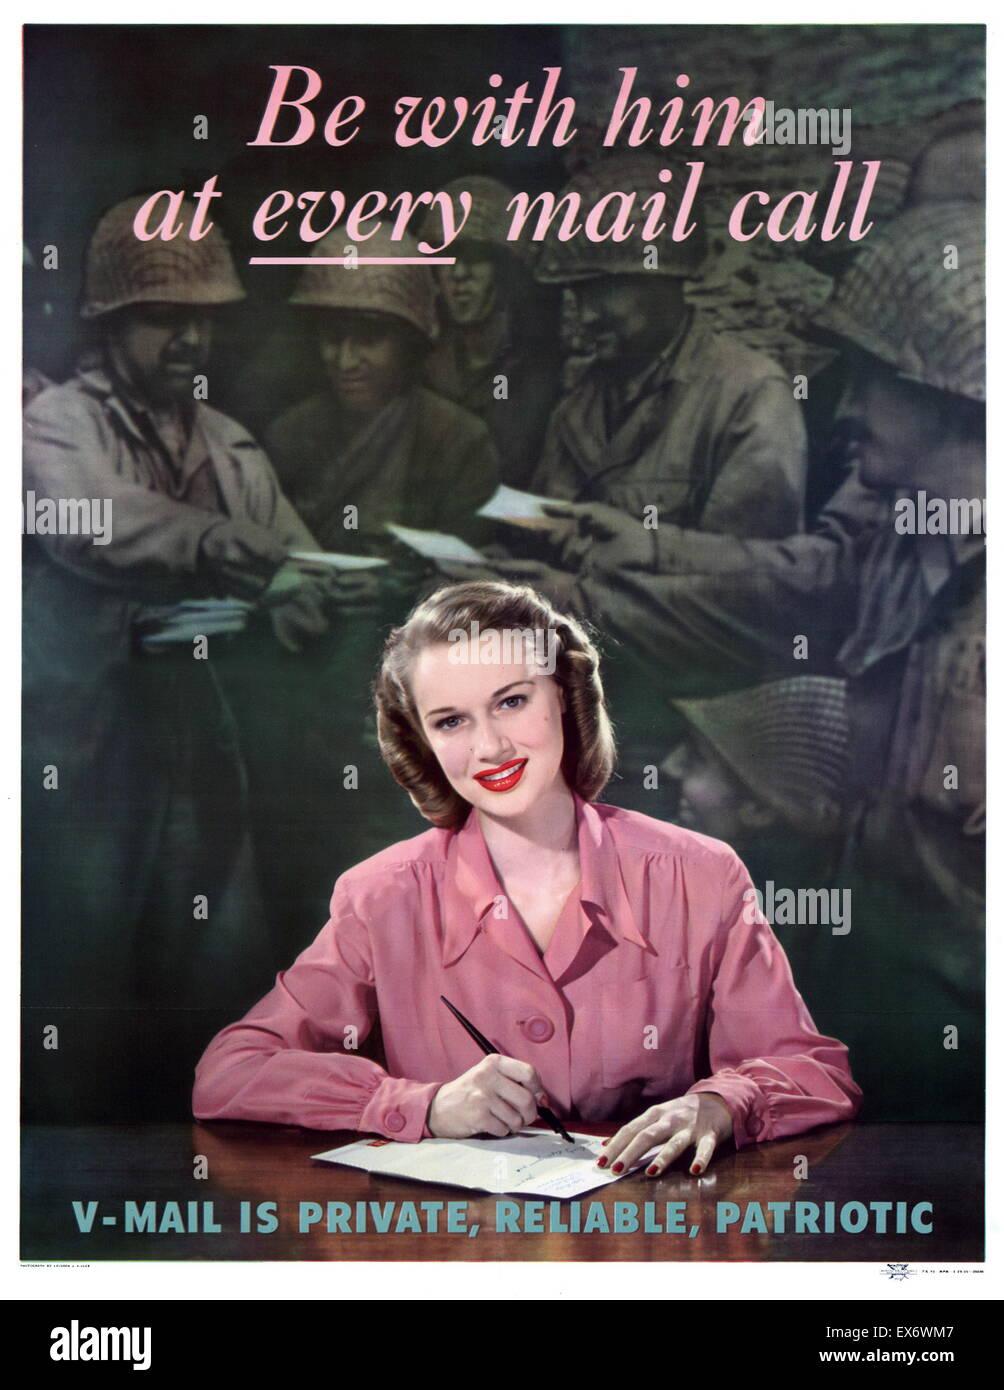 World War Two American Propaganda Poster Encouraging